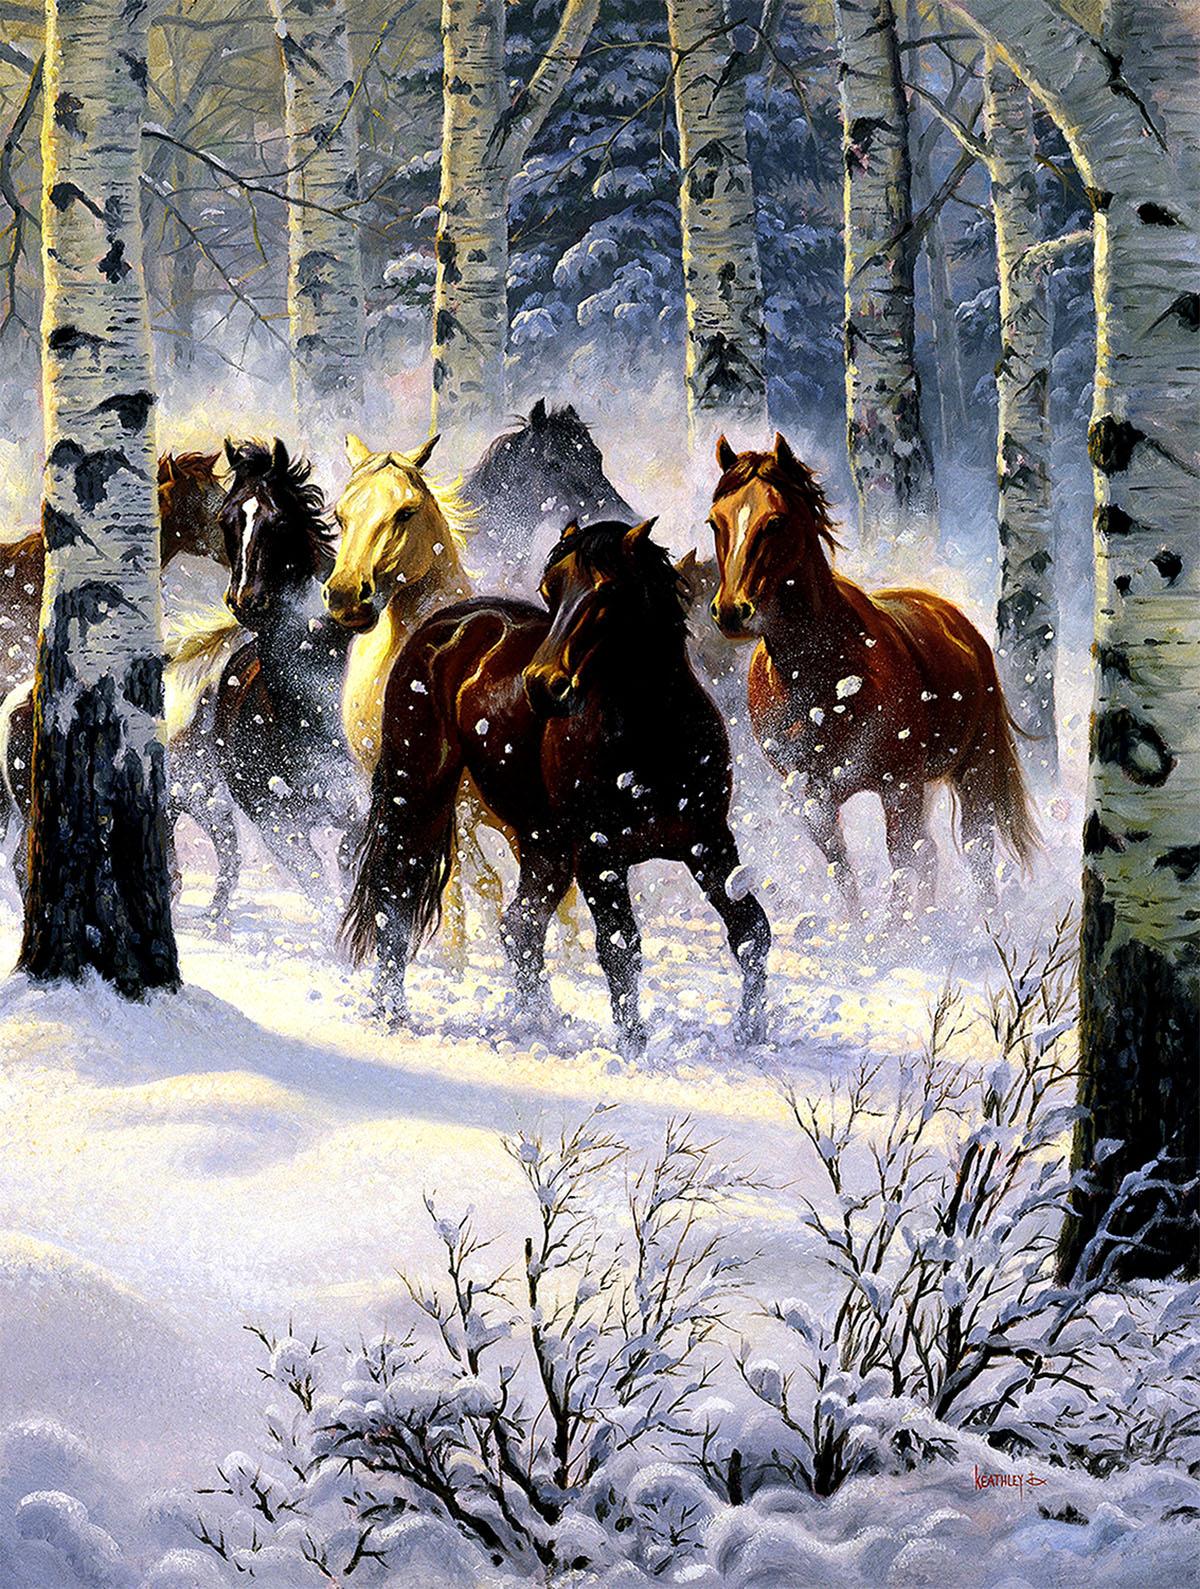 Snow Storm Horses Jigsaw Puzzle